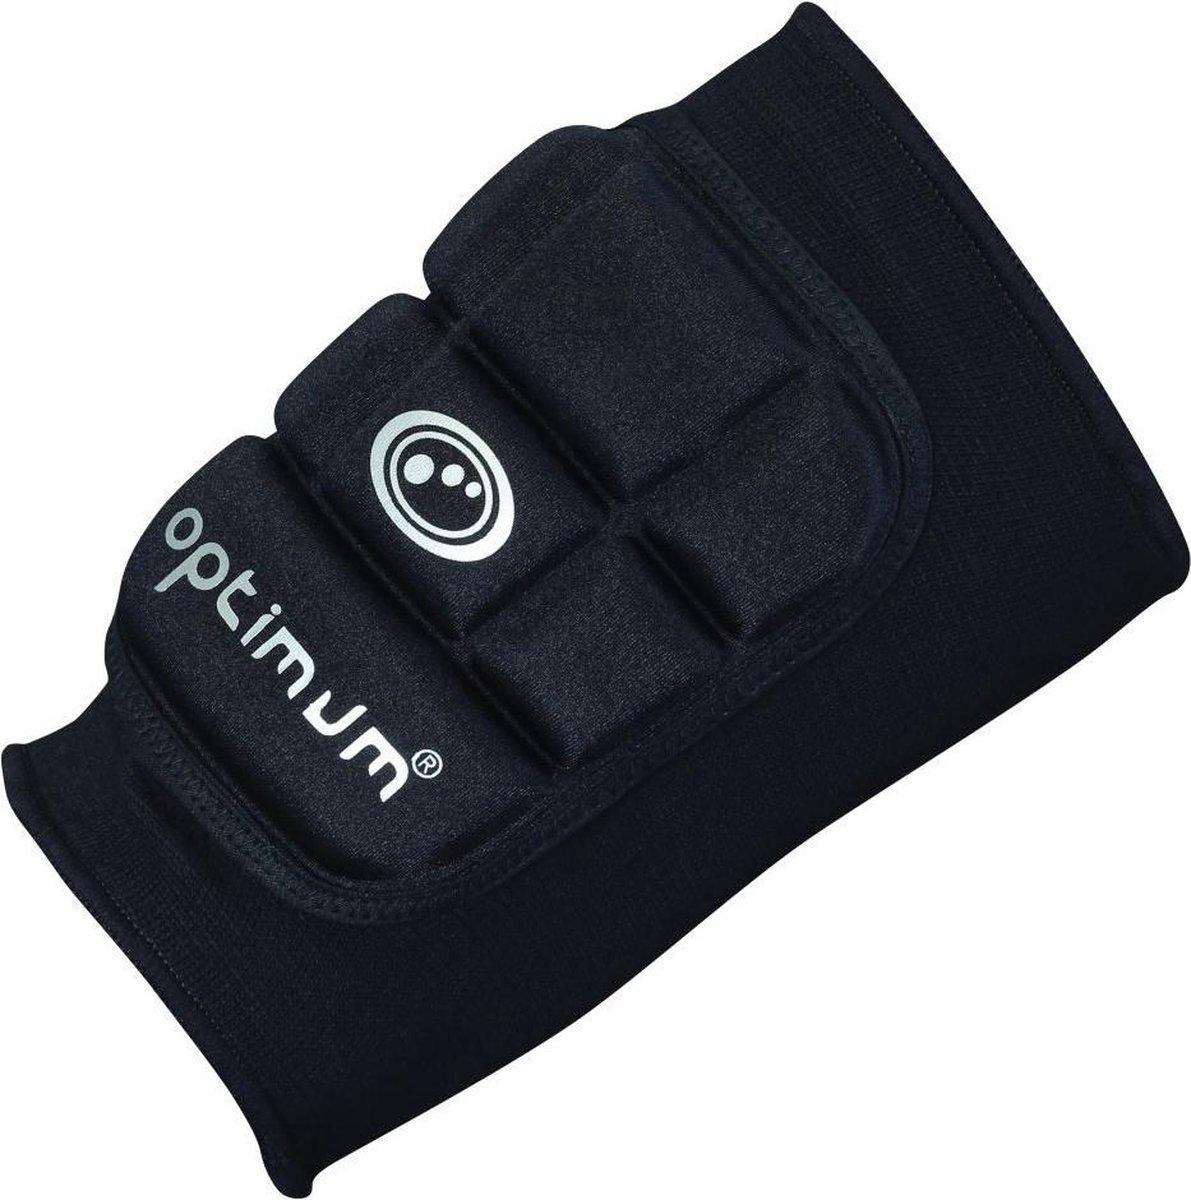 Optimum Biceps bescherming - maat S